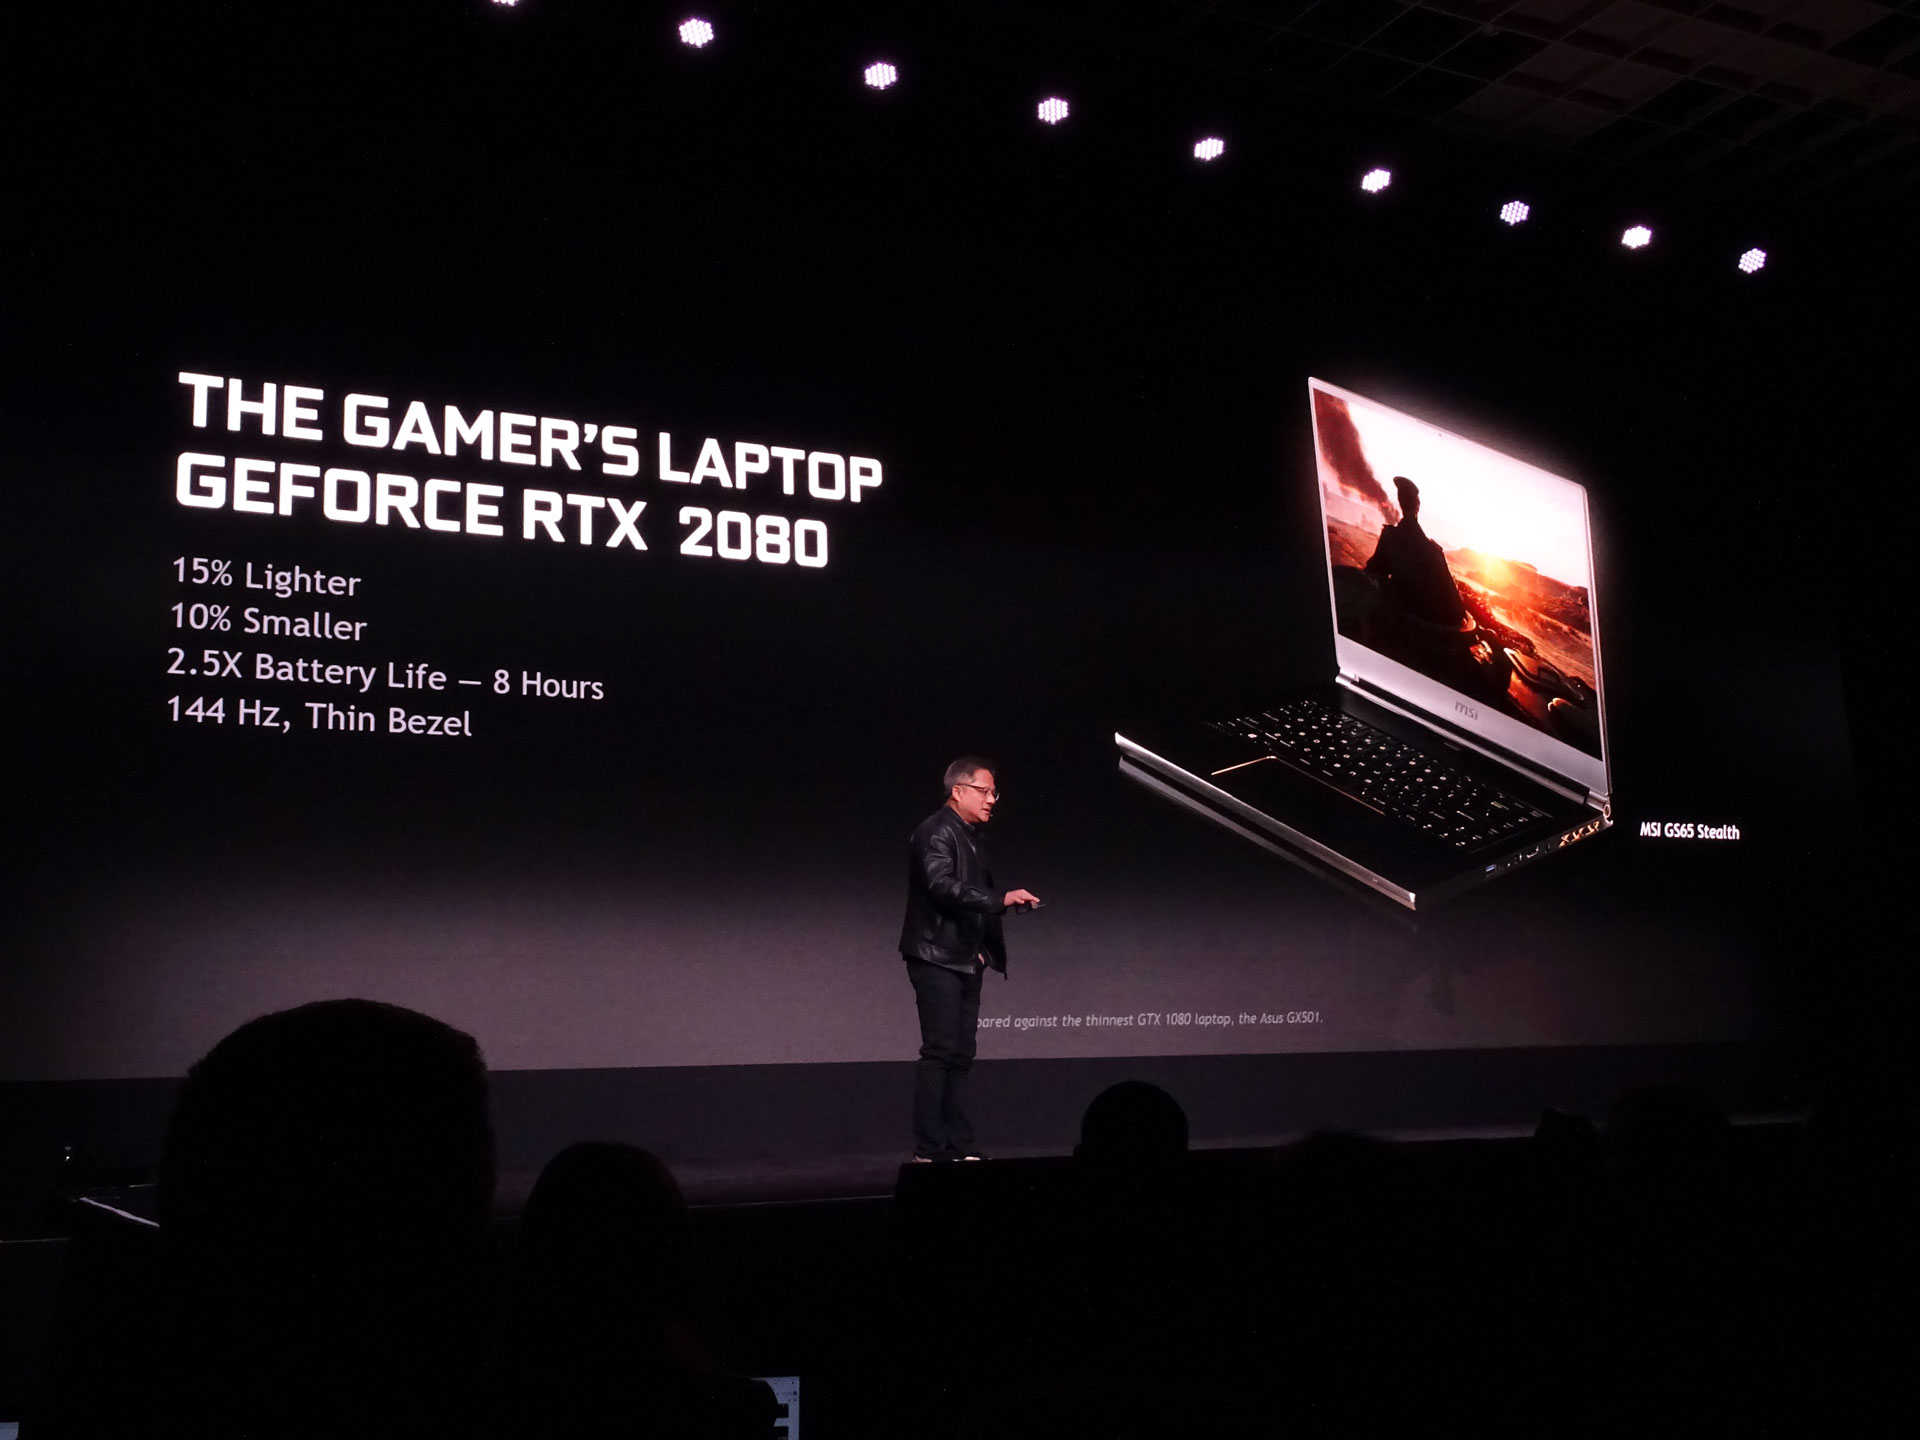 NVidia GeForce RTX 2080: CES 2019